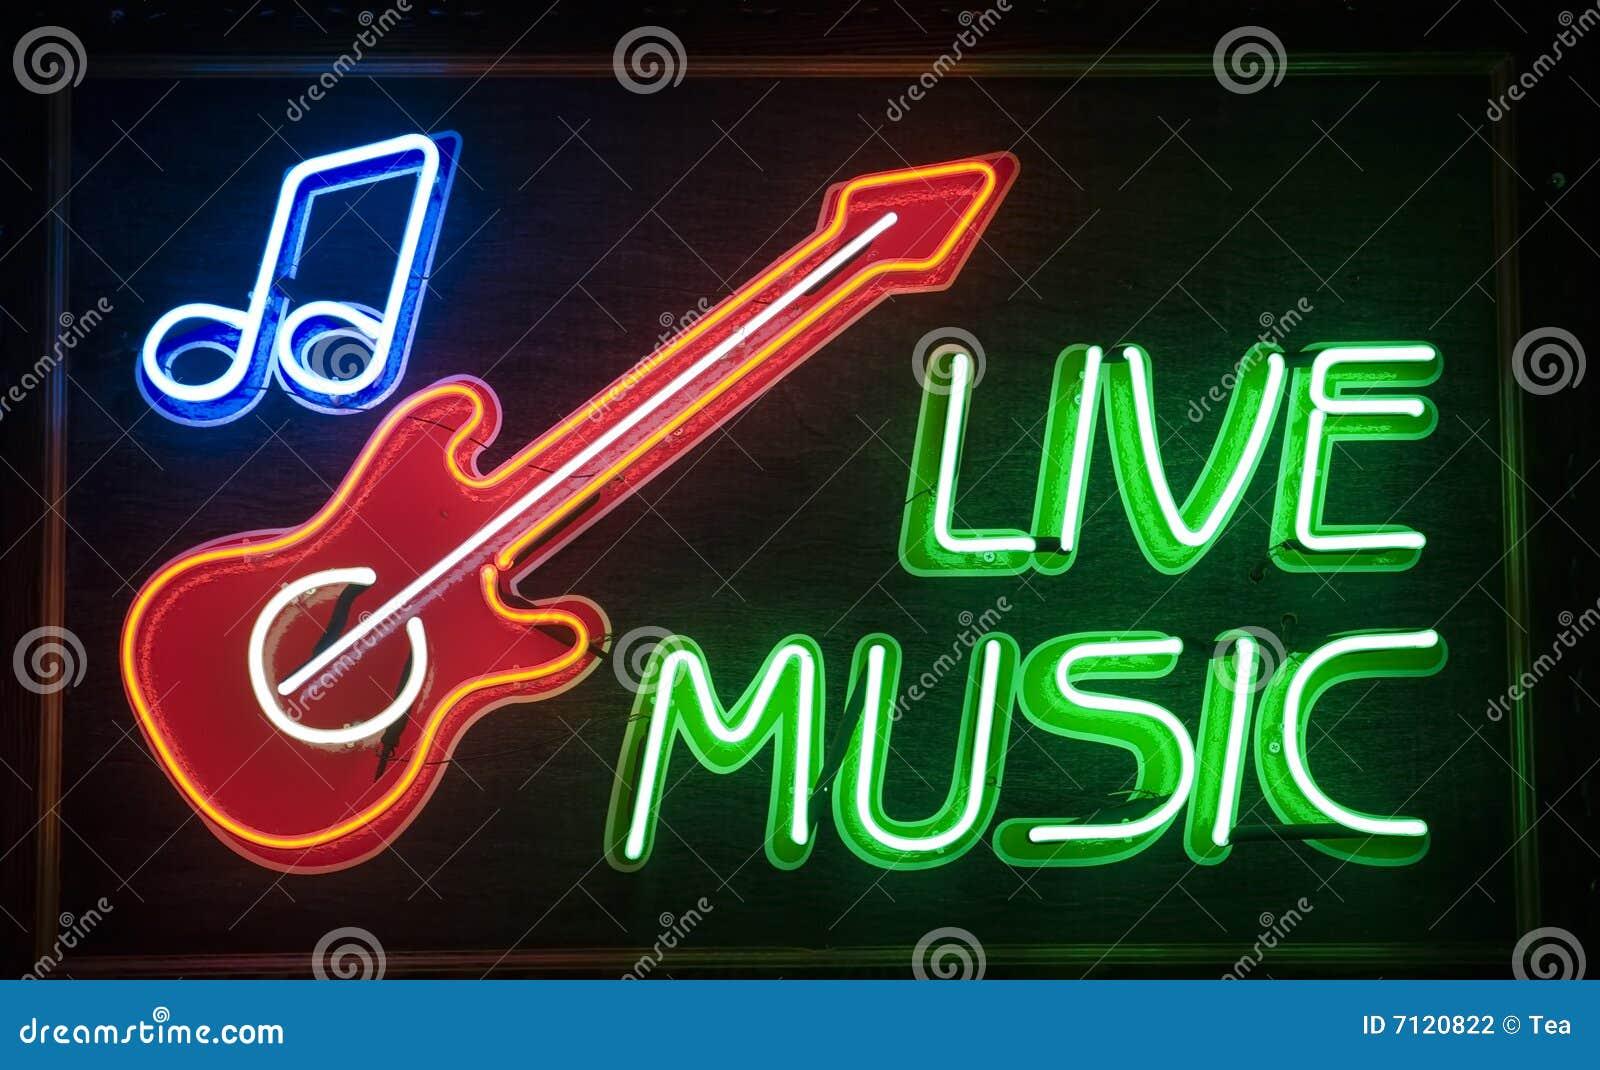 live-music-7120822.jpg